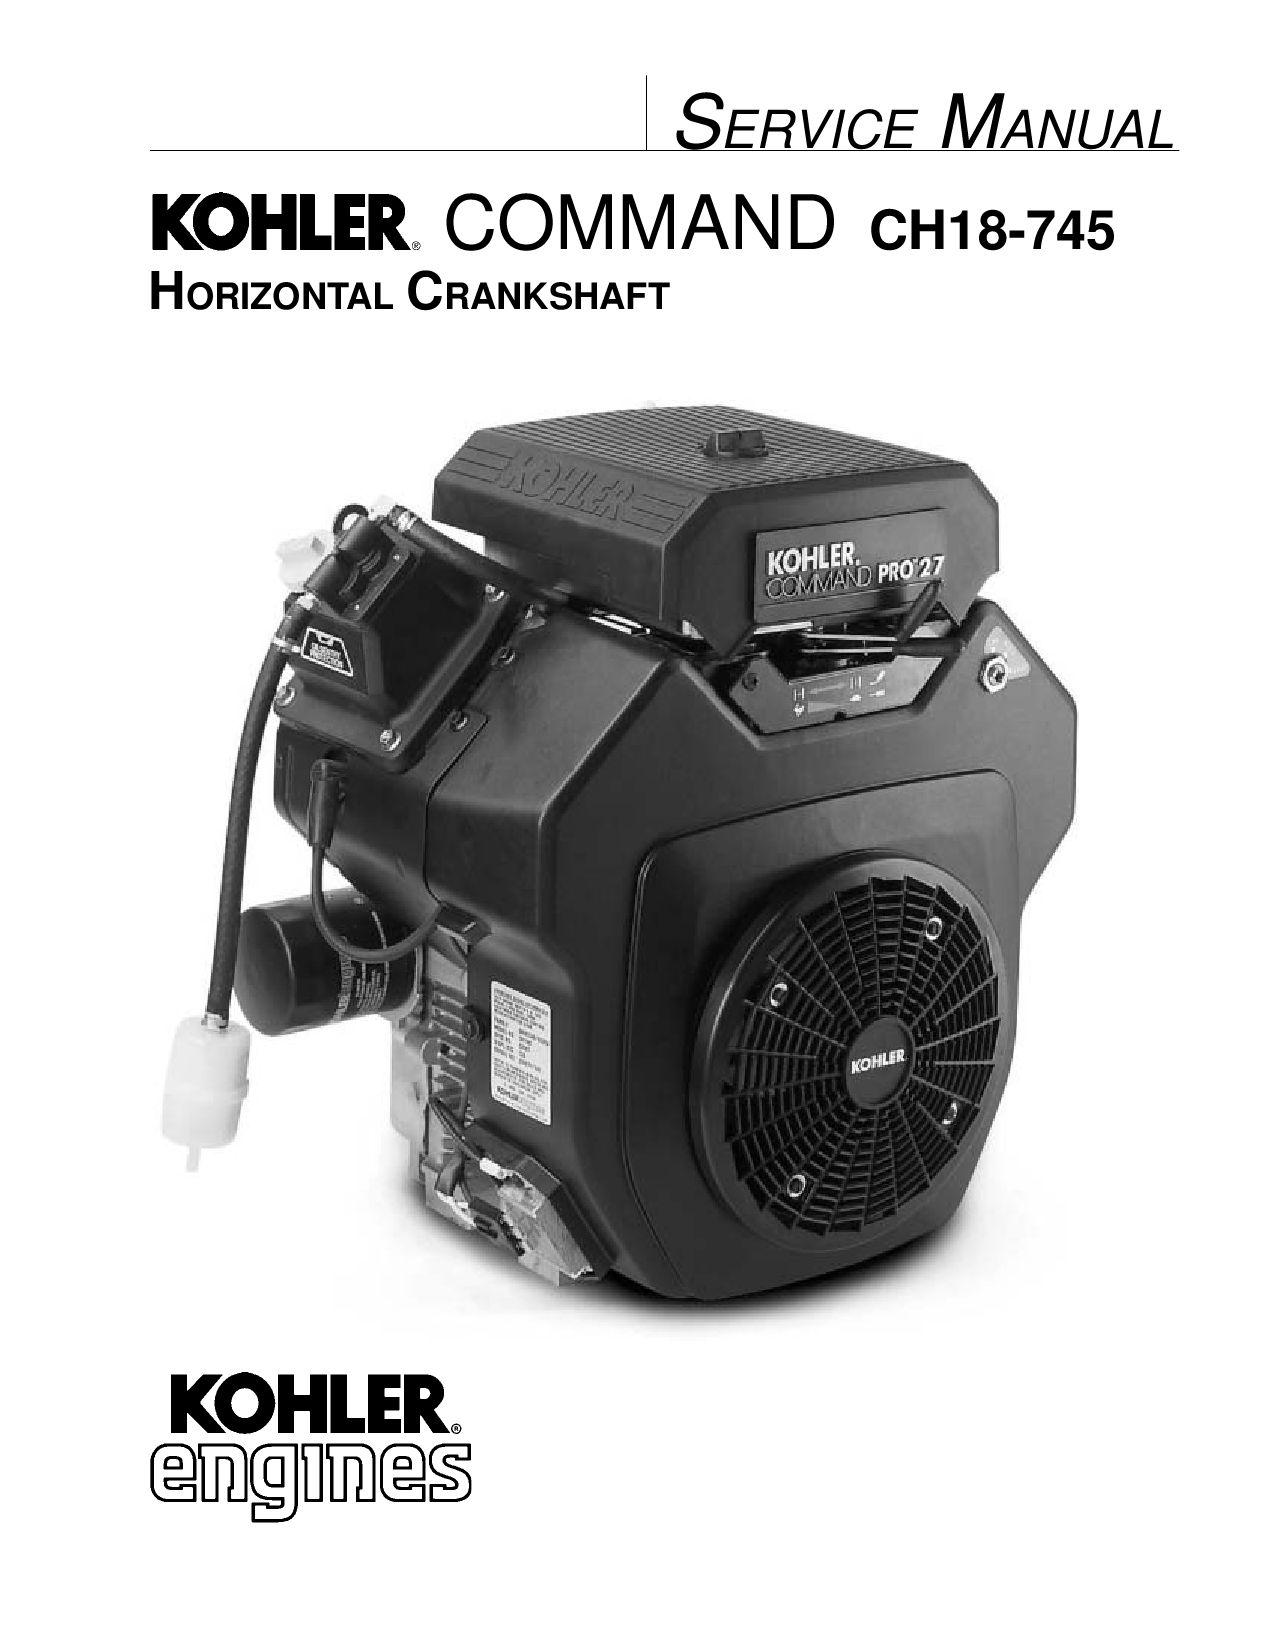 ko_comnd Kohler Engine TIPS PRO FORCE BLOWER 2009 by